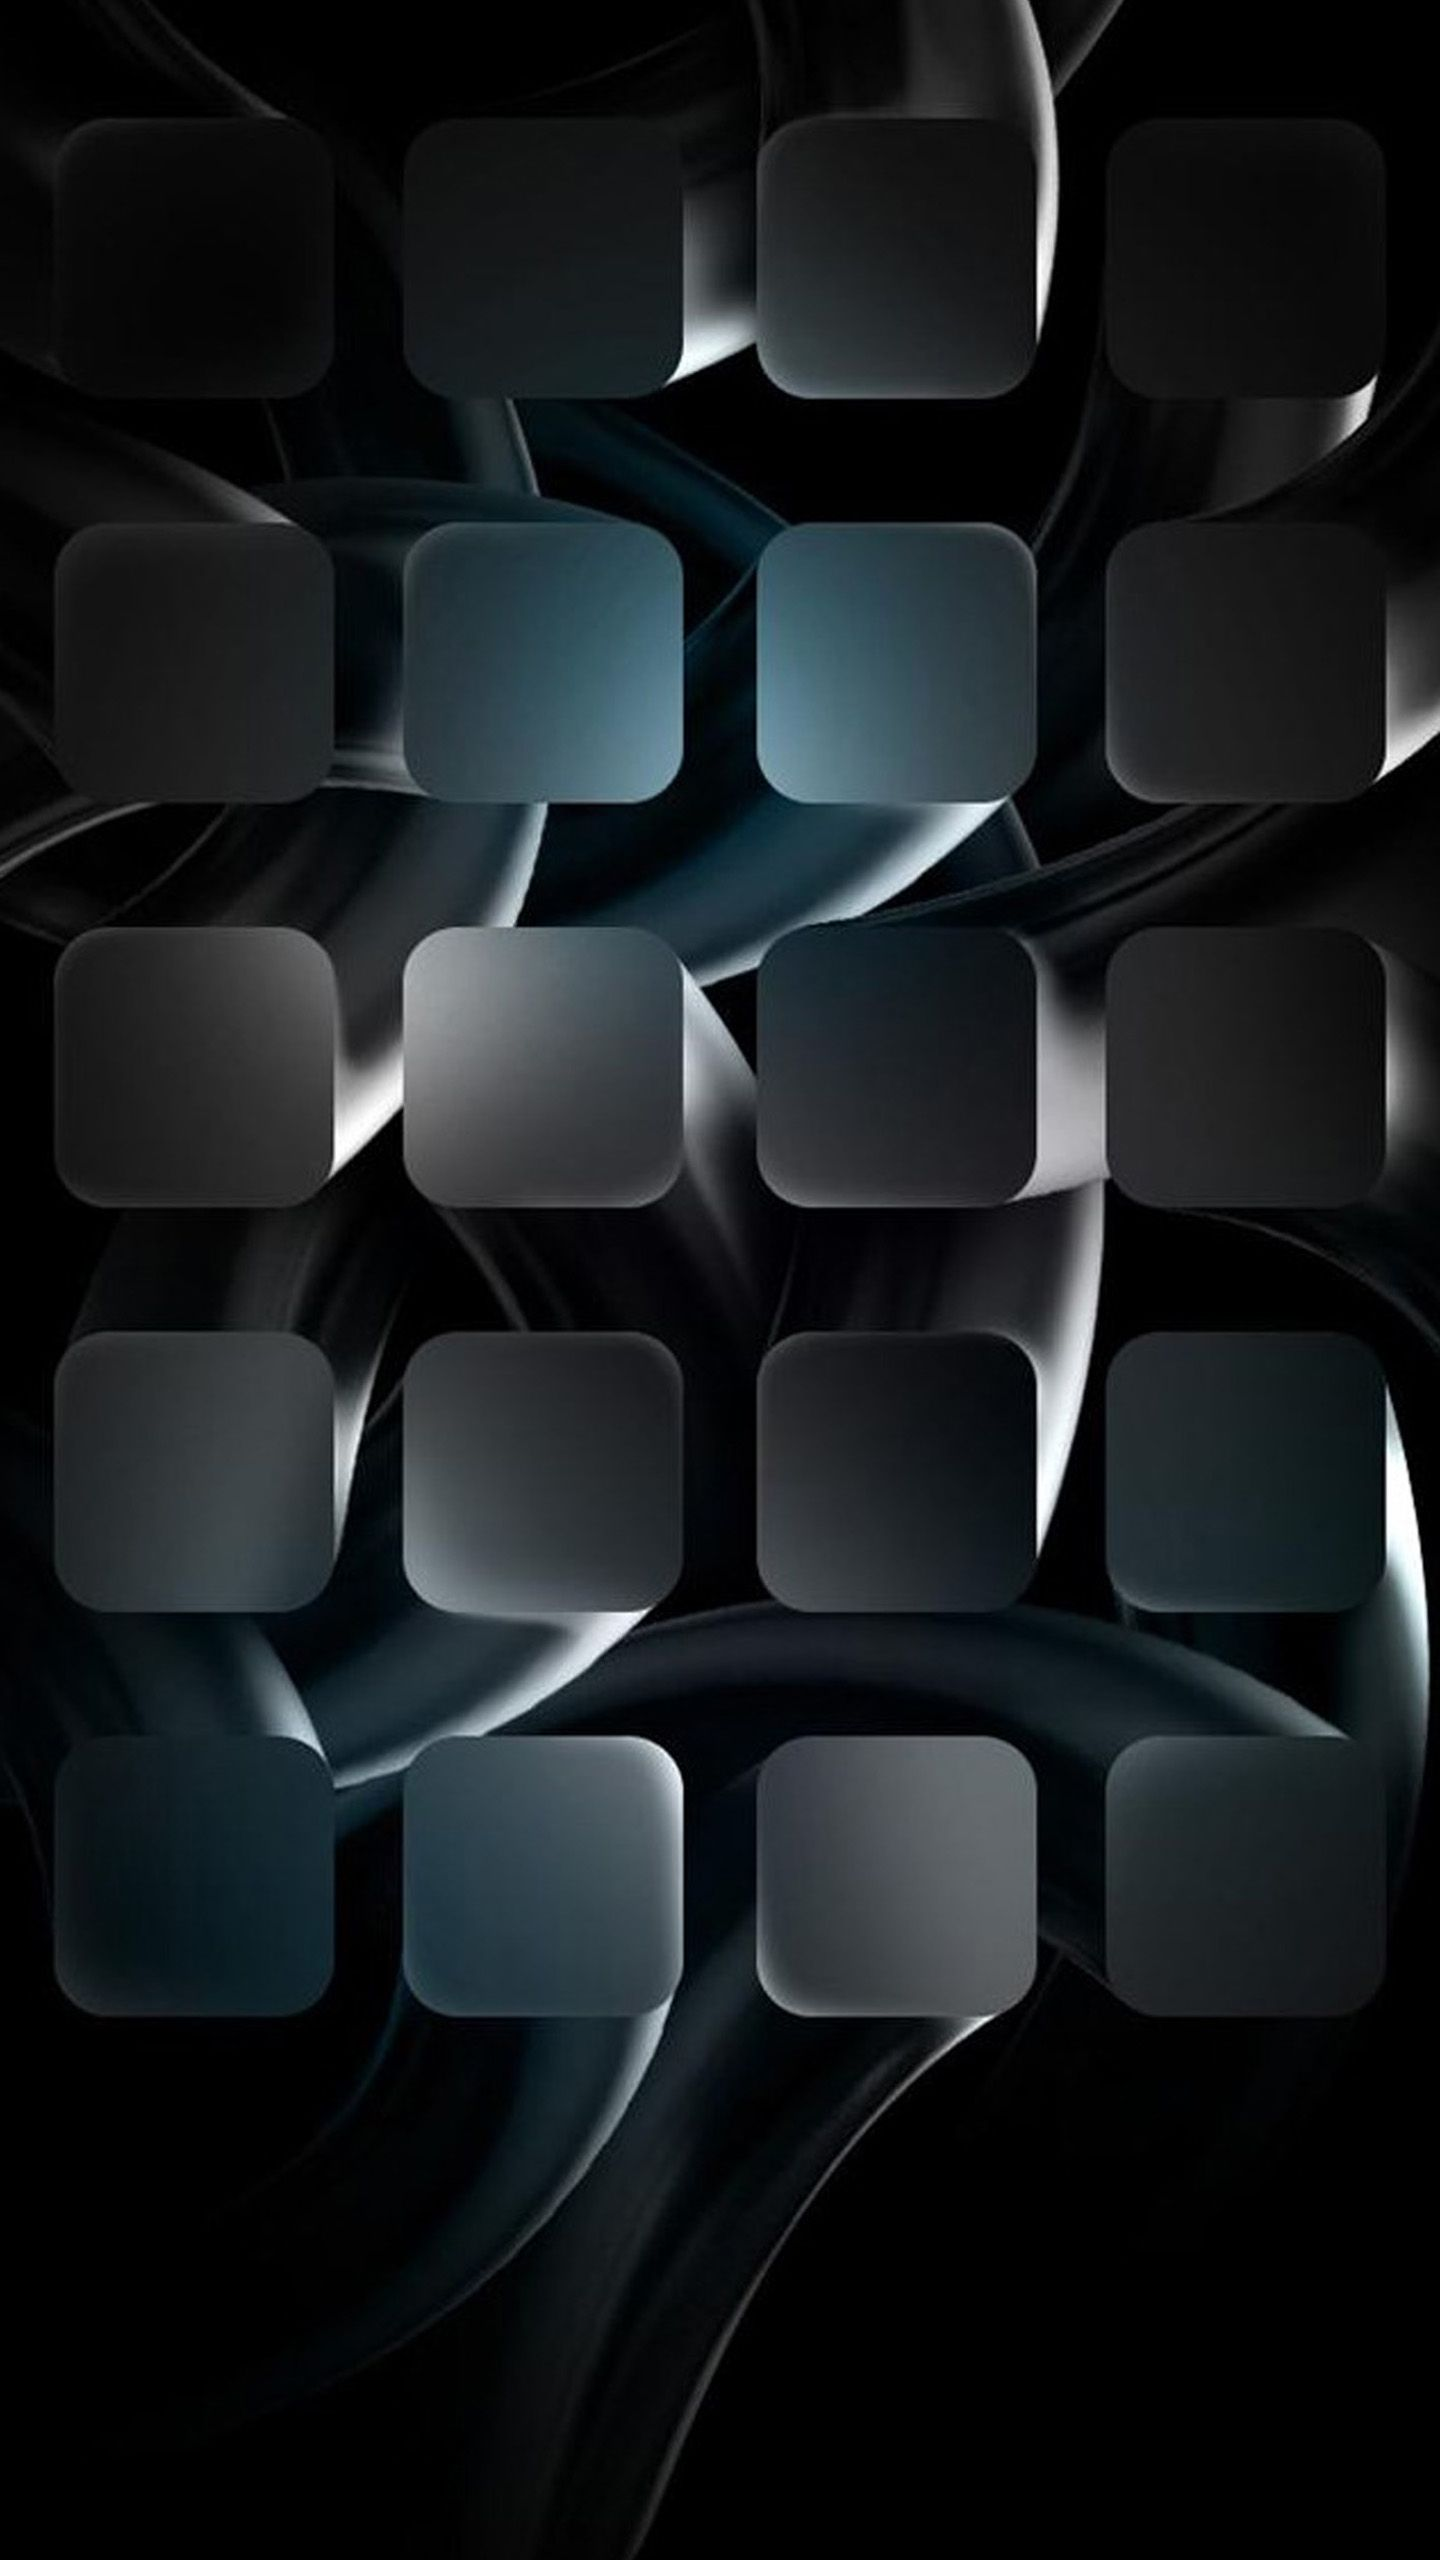 Lg Hd Wallpaper Black Phone Wallpaper Homescreen Iphone Motorola Wallpapers